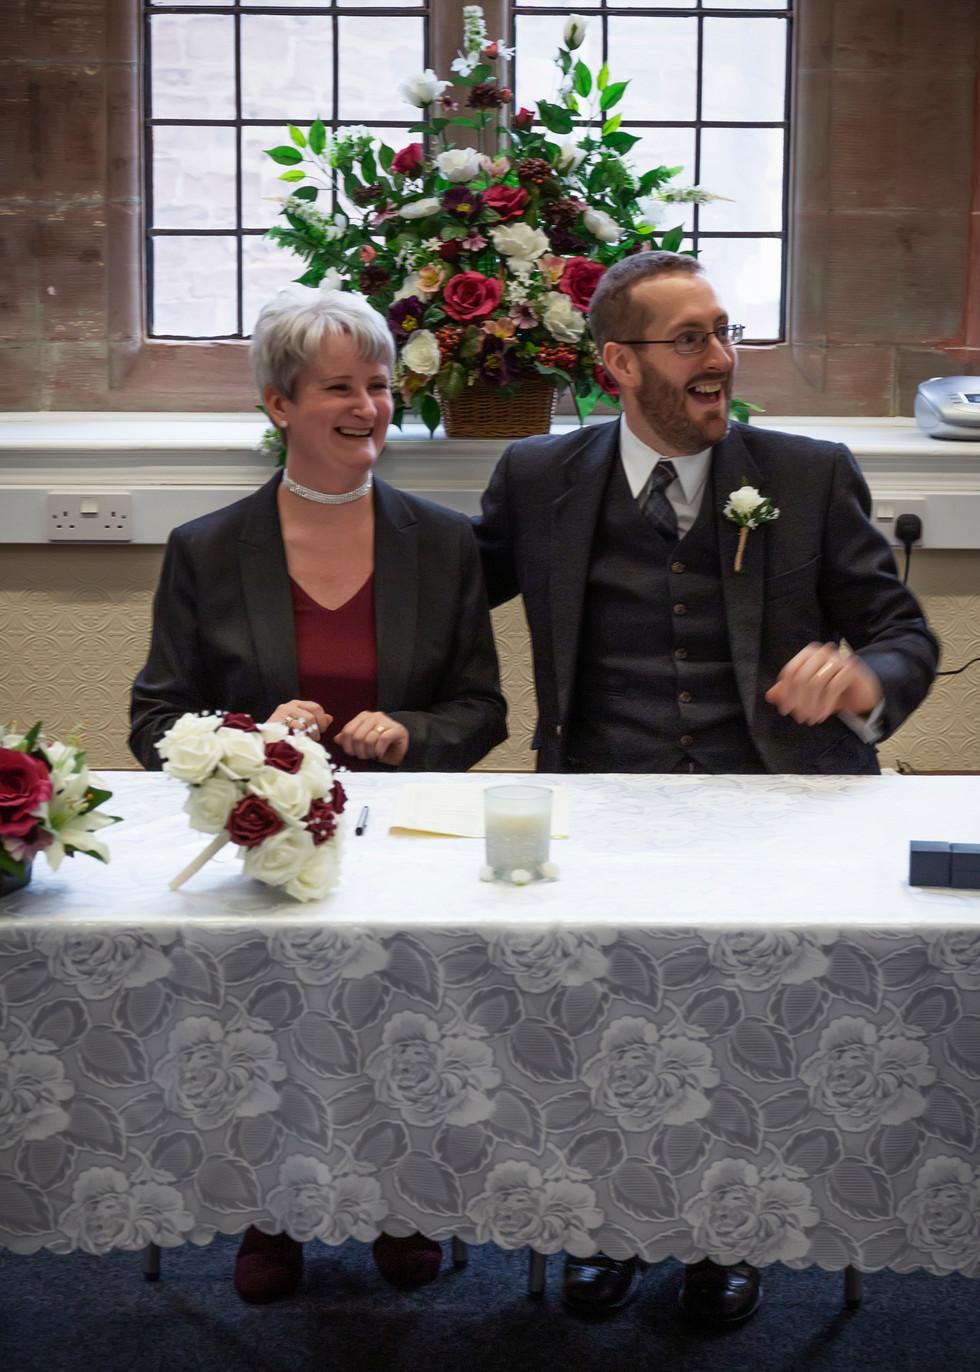 Wedding final edit (7).jpg